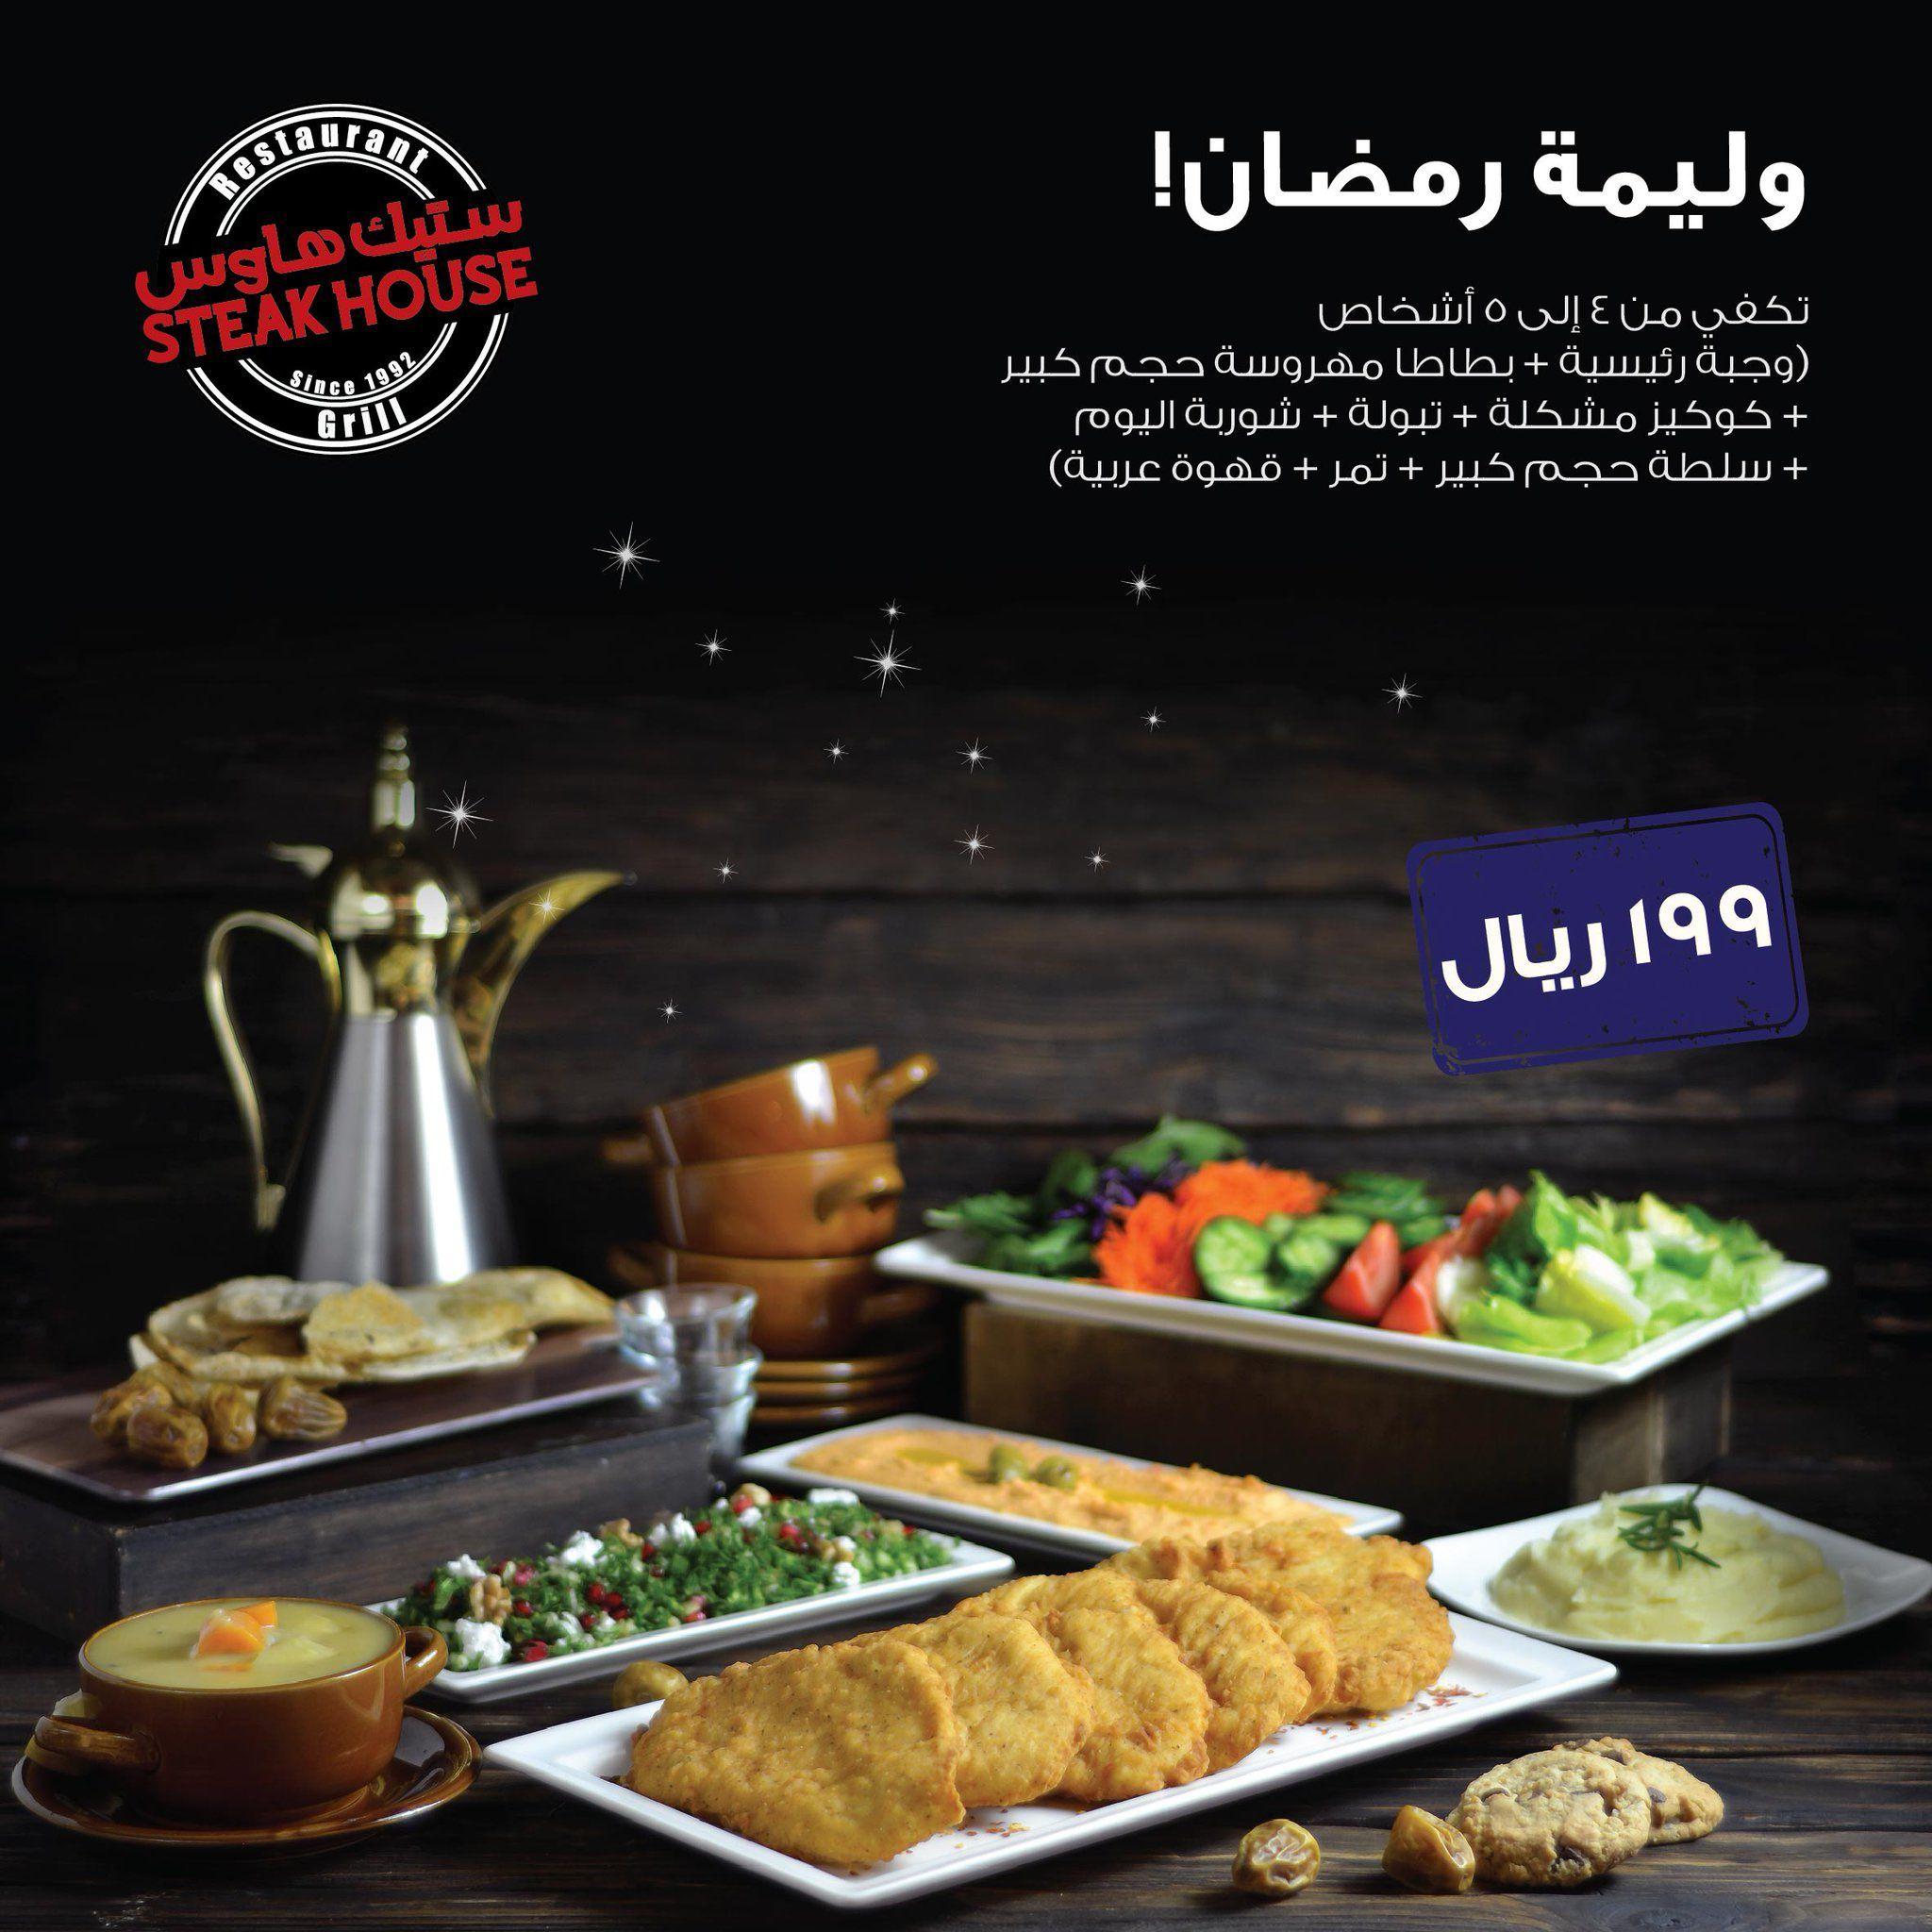 عروض رمضان عروض مطاعم ستيك هاوس علي وليمة رمضان بـ 199 ريال سعودي عروض اليوم